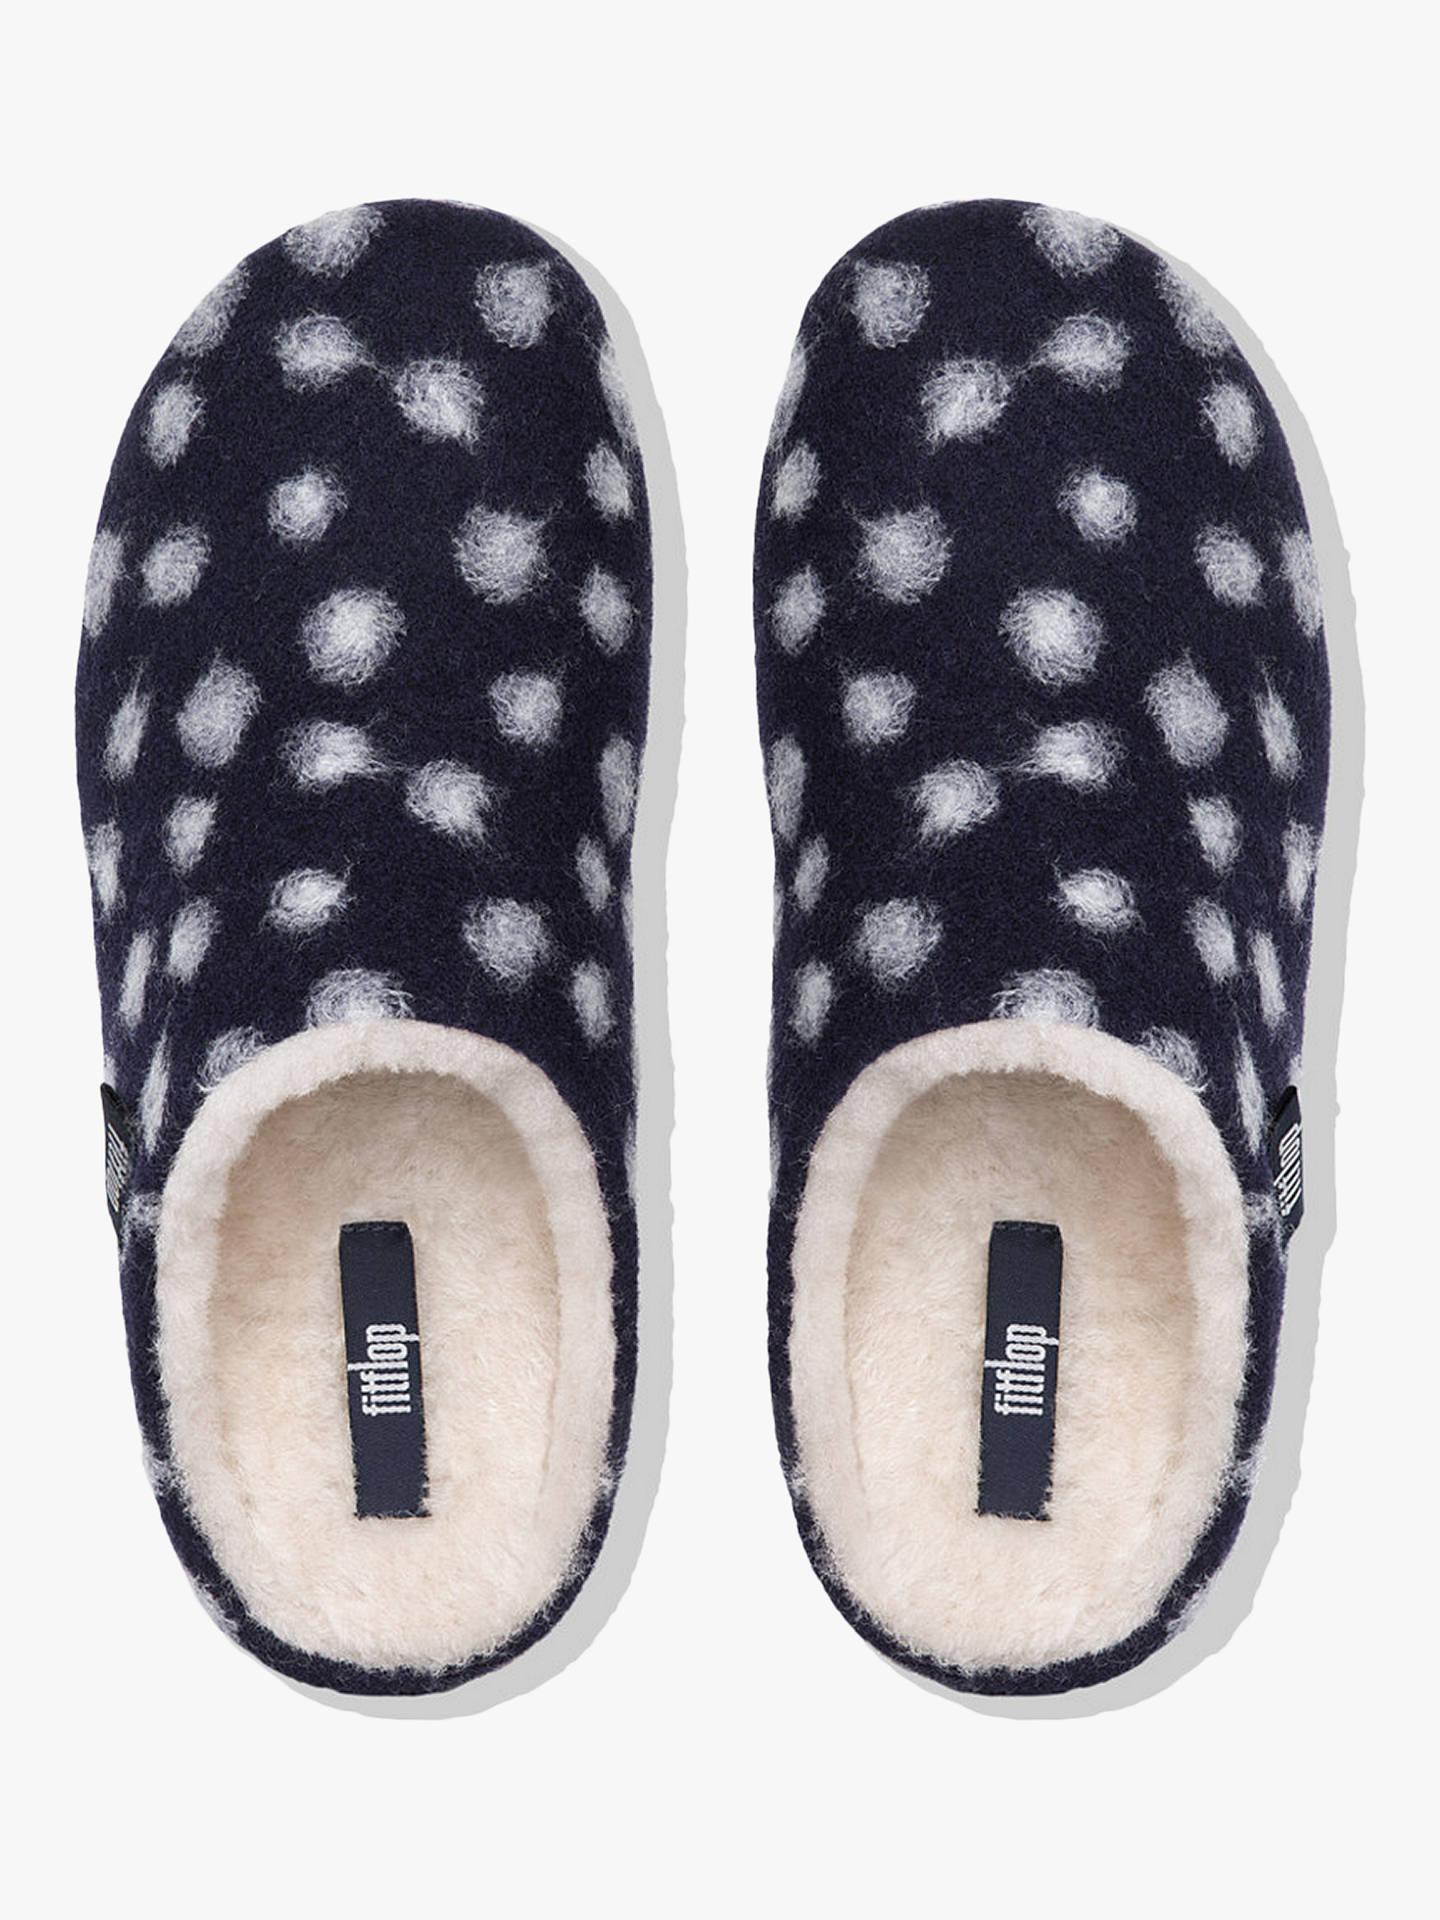 c4f6d4ce8 ... Buy Fitflop Chrissie Spot Print Woollen Slippers